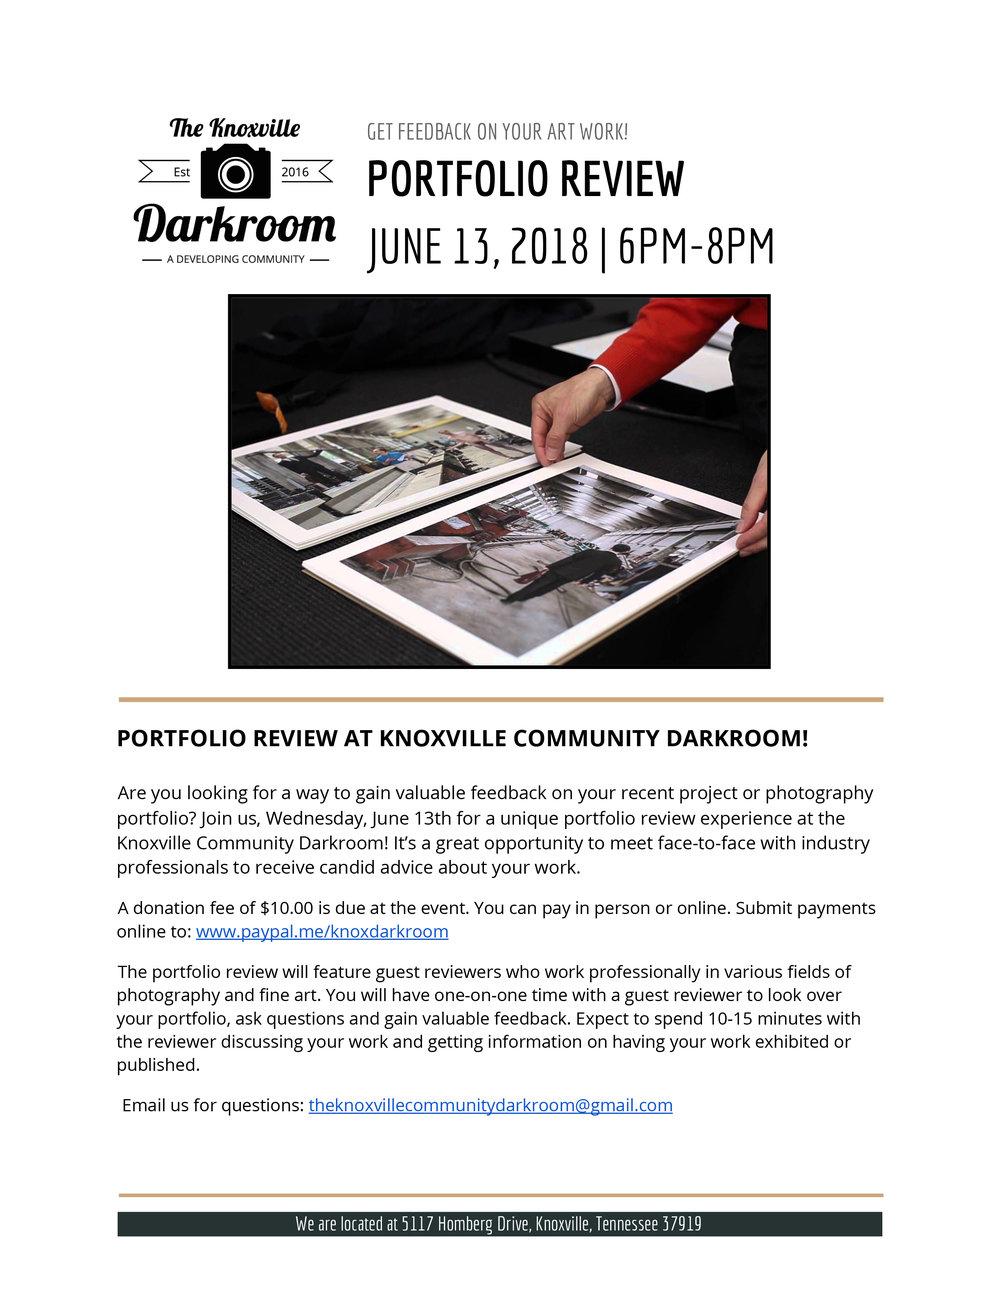 KCD Flyer - Portfolio Review.jpg